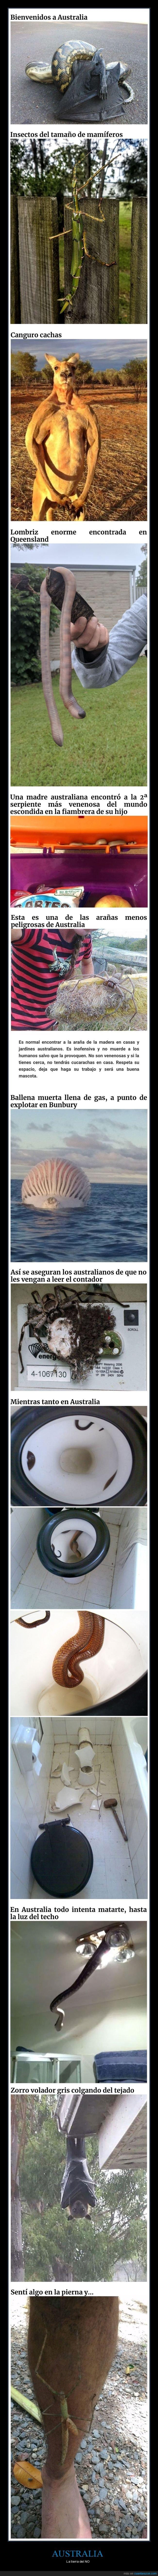 animales,australia,wtf